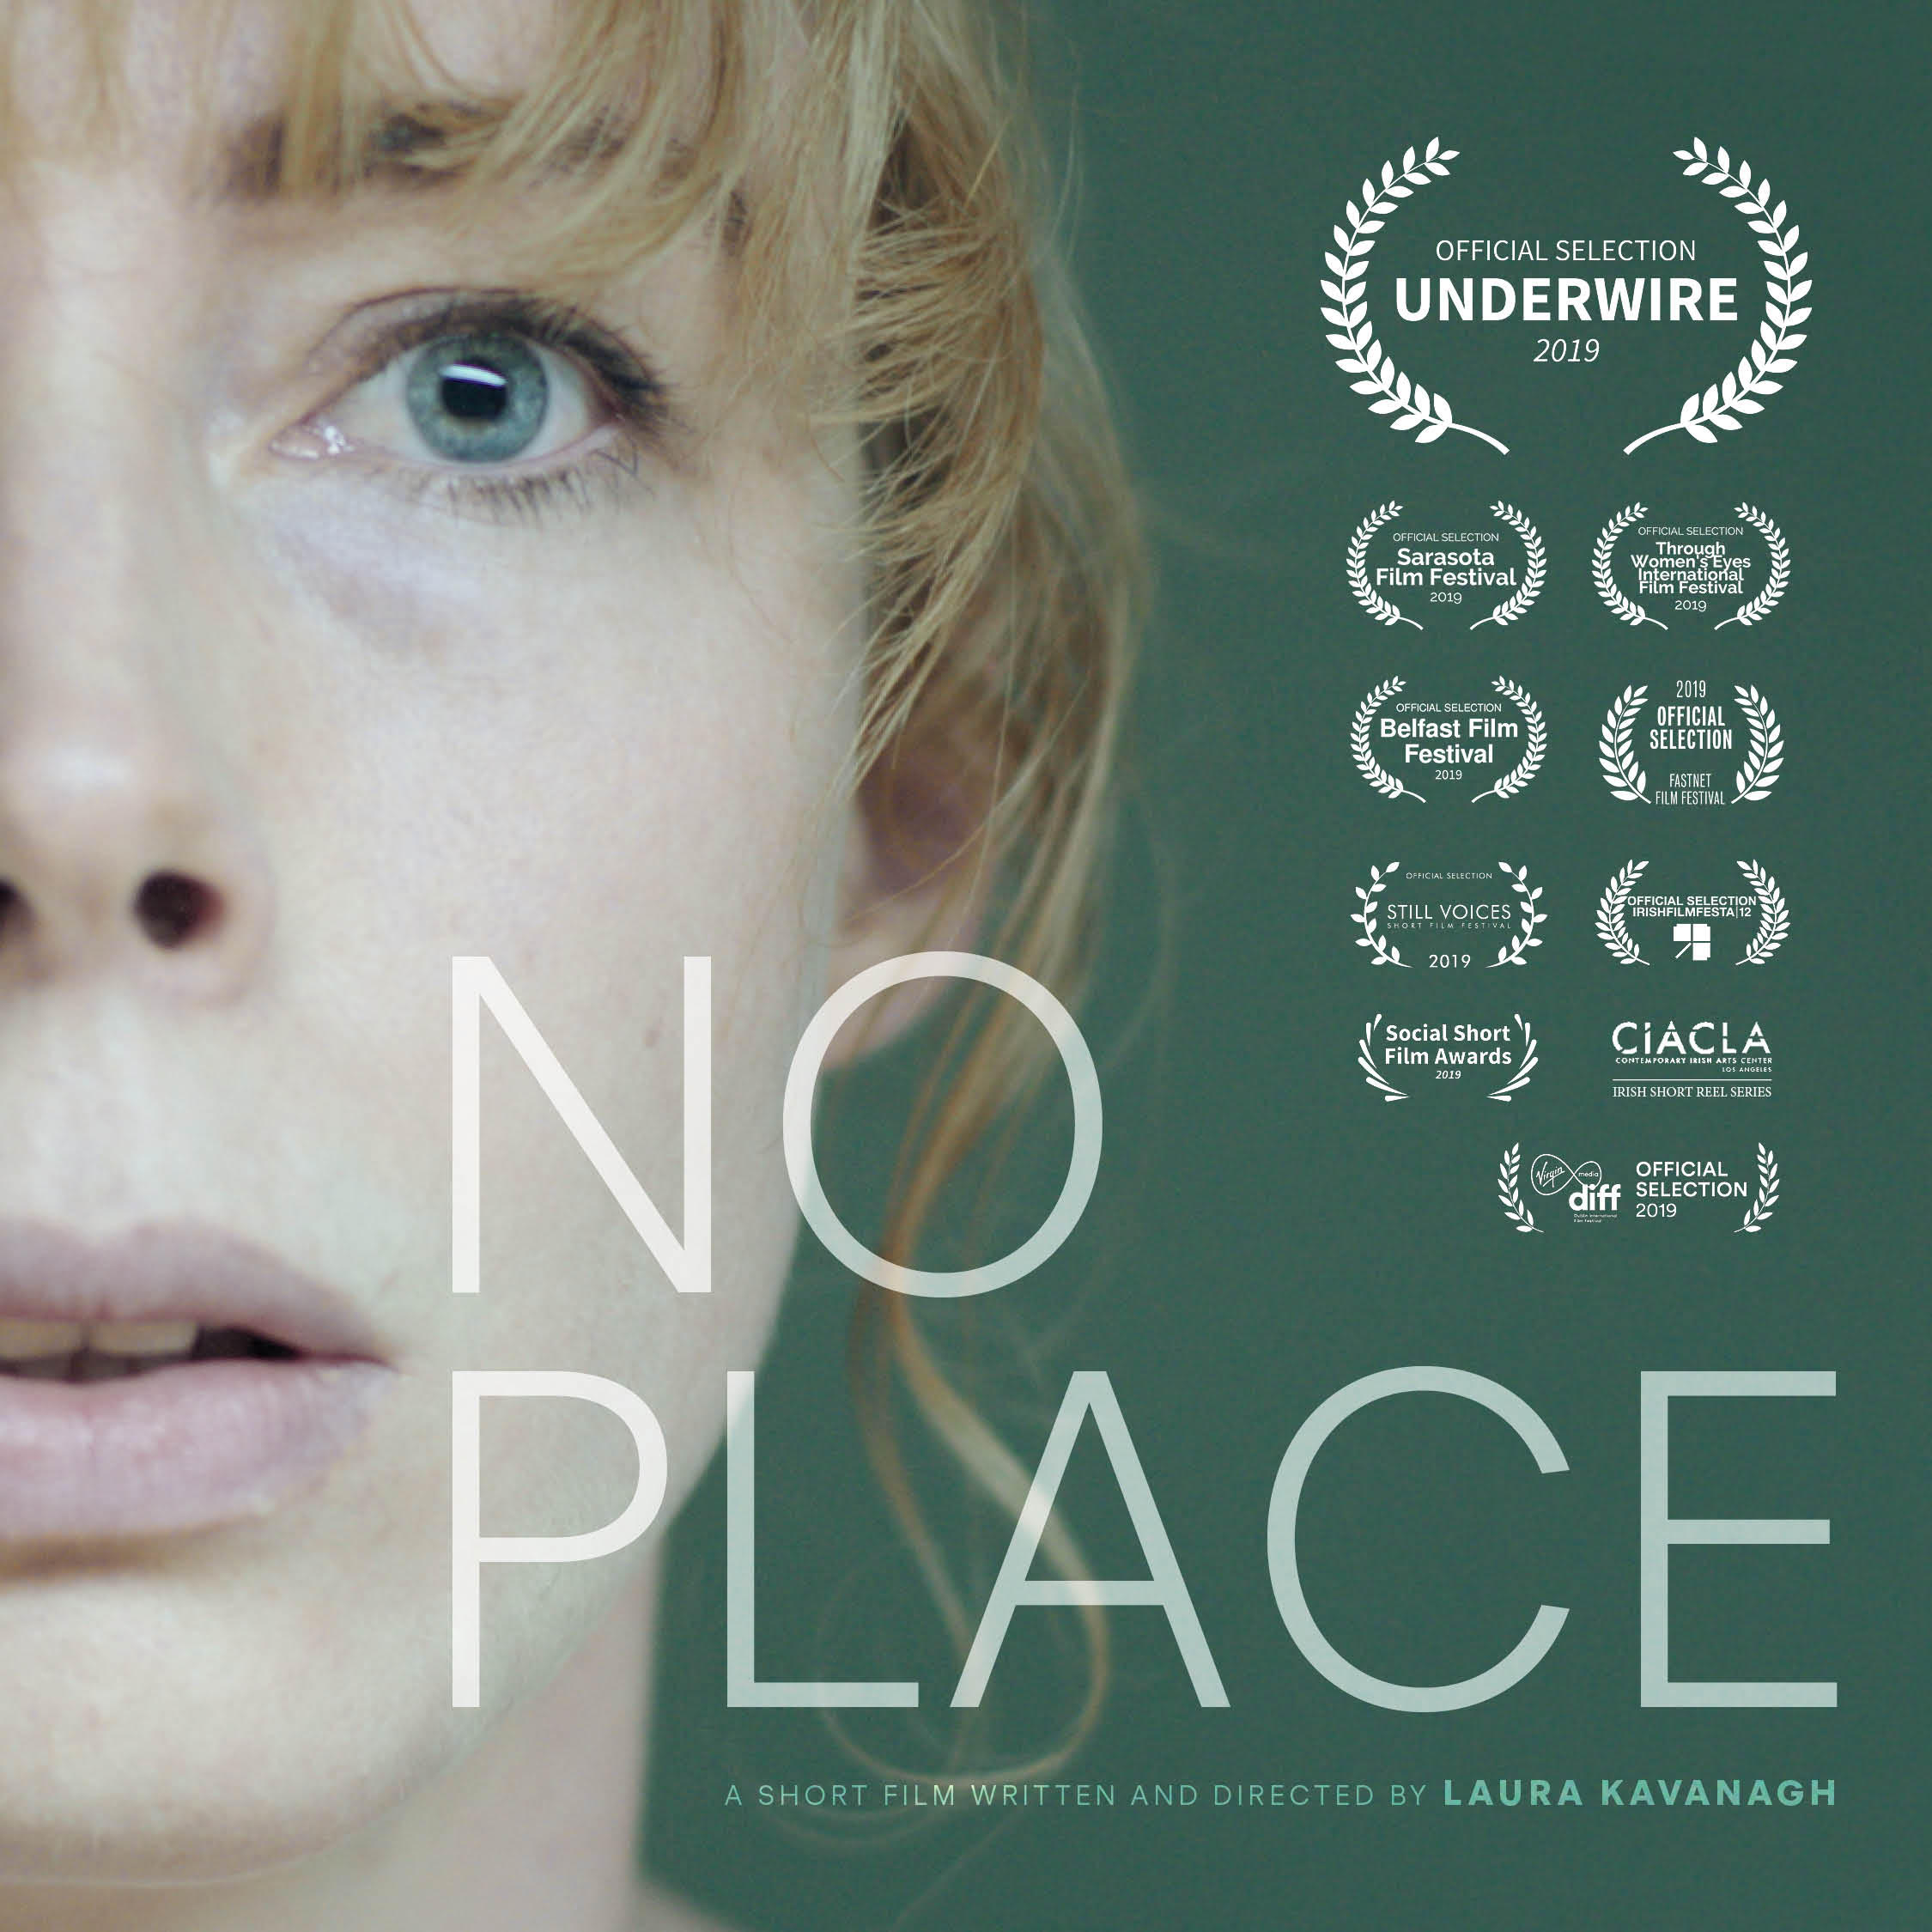 Laura Kavanagh's Short NO PLACE